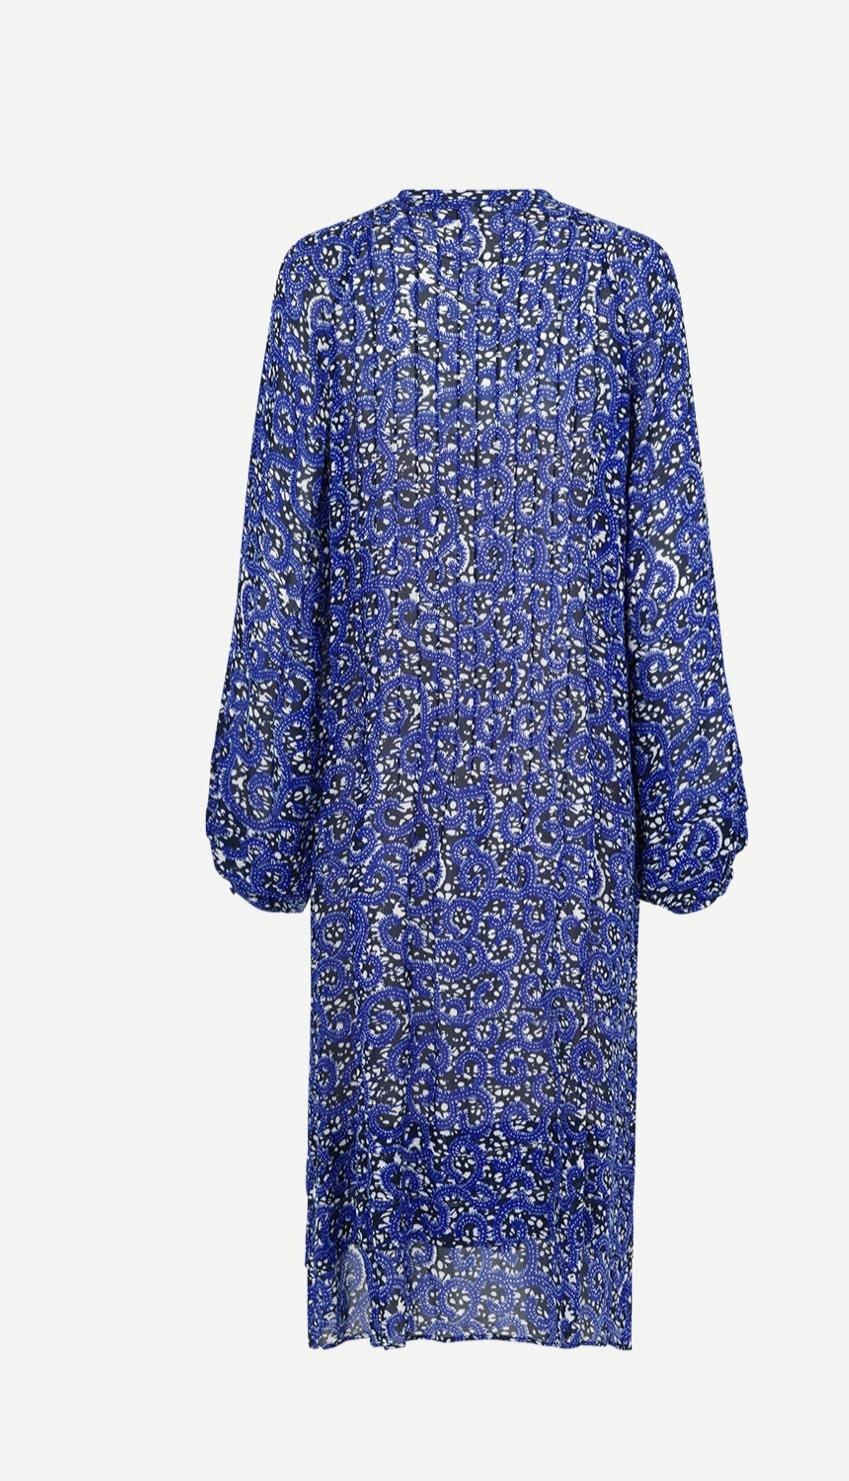 Elma Shirt dress aop Samsoe Samsoe-6